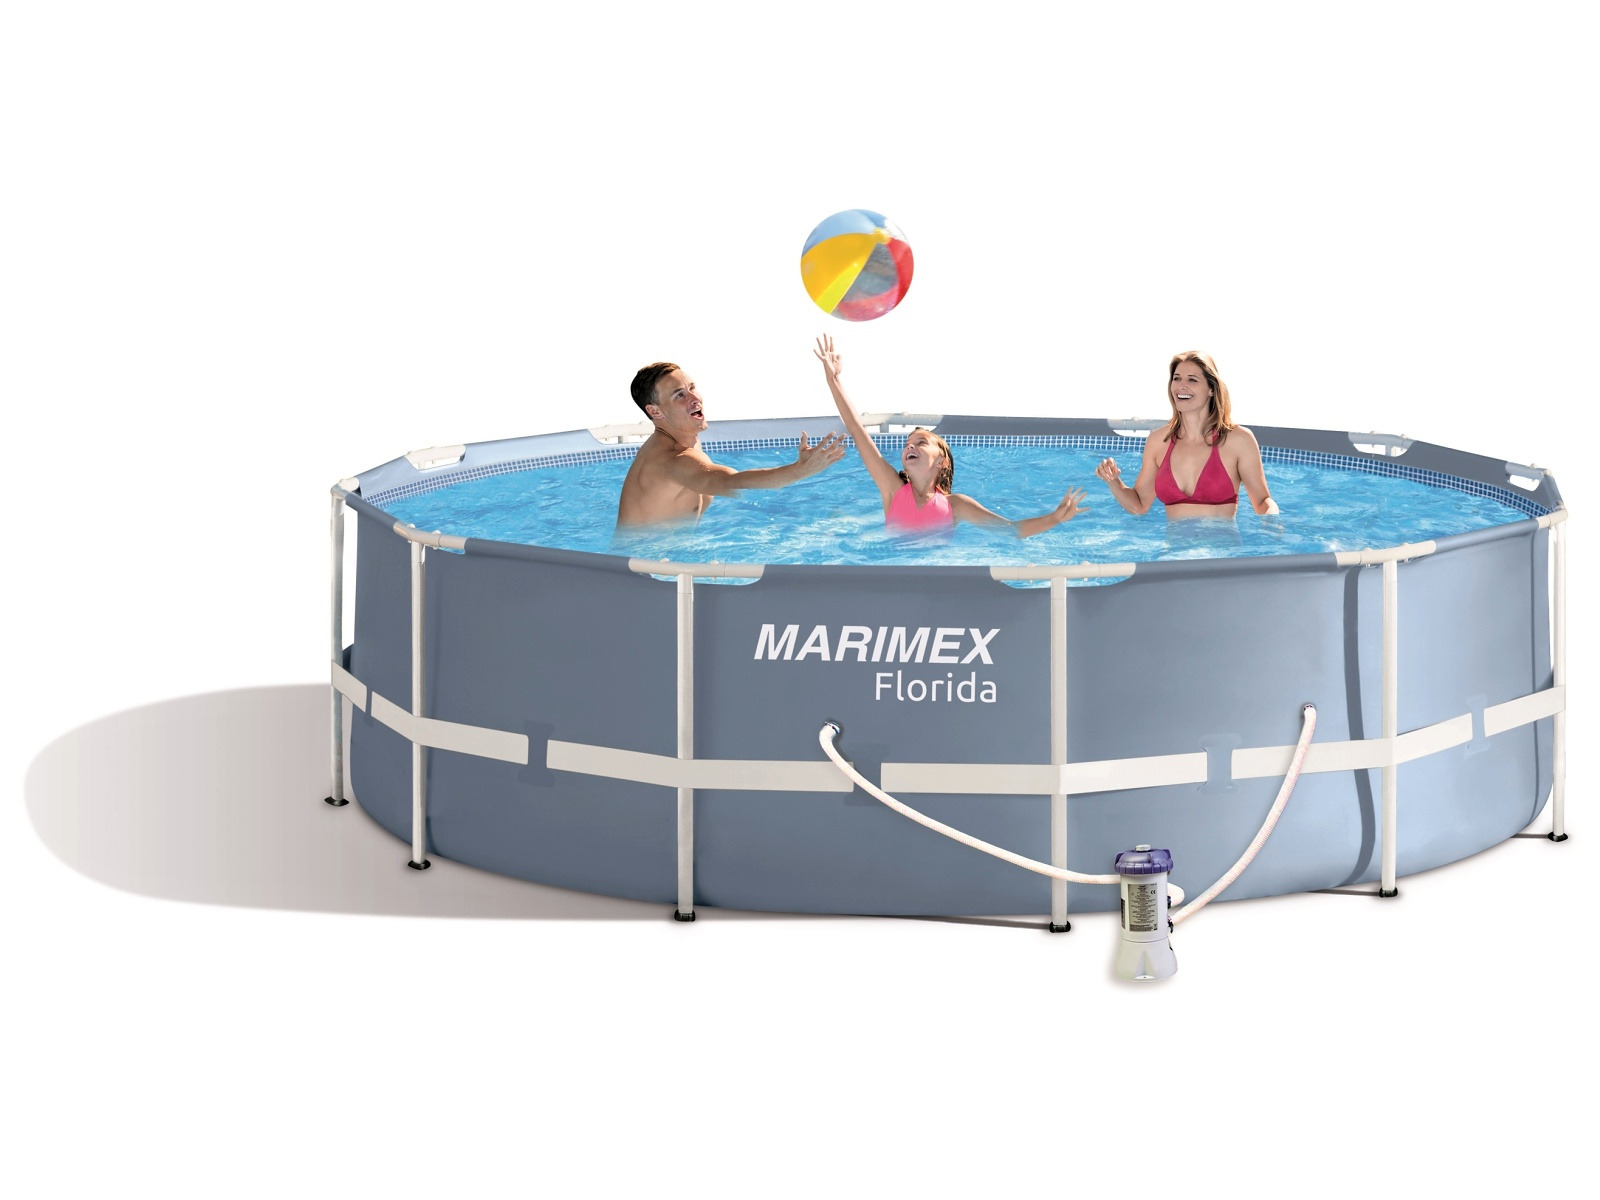 Bazén MARIMEX Florida 366 x 99 cm set s kartušovou filtrací